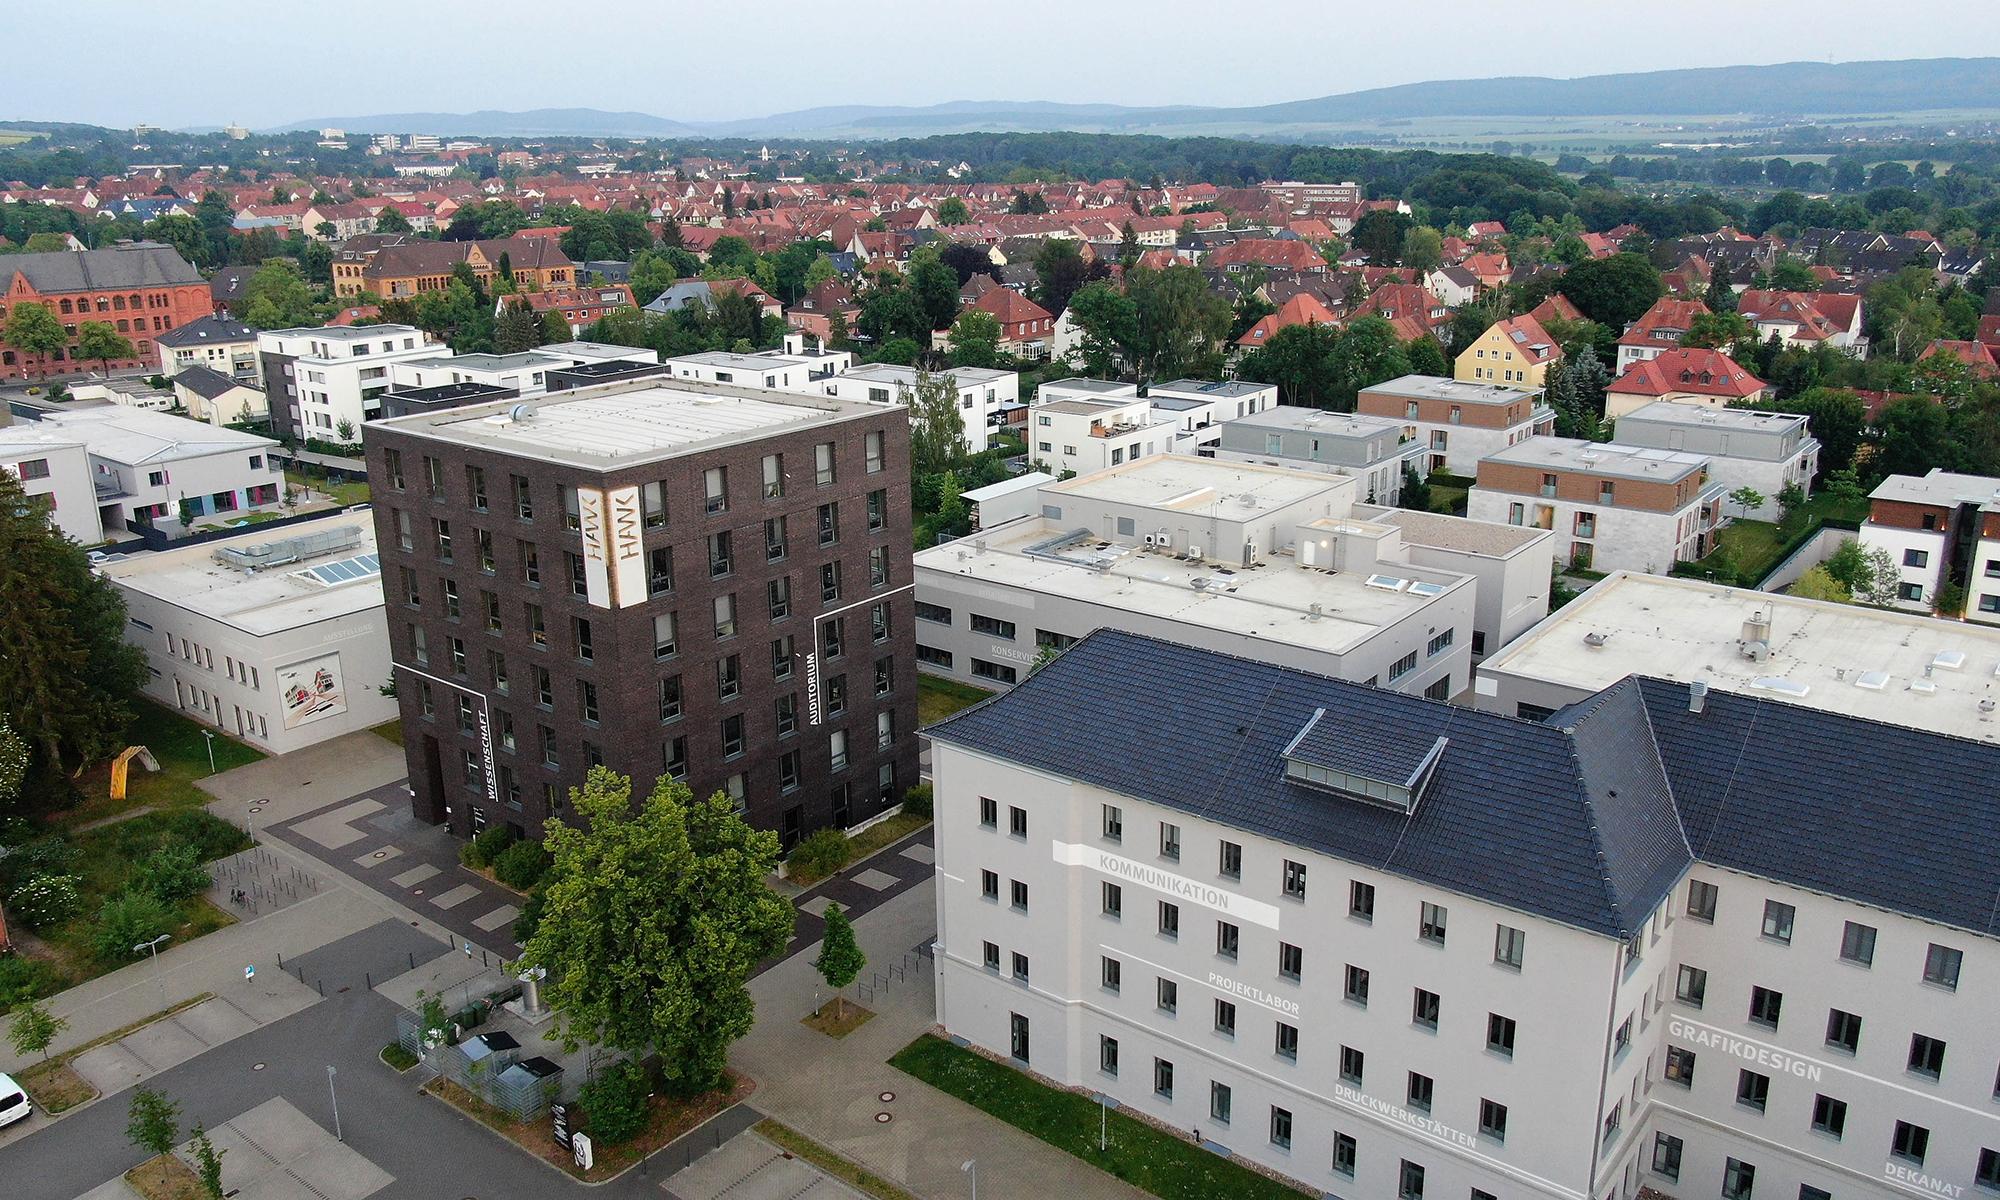 Digital in Hildesheim